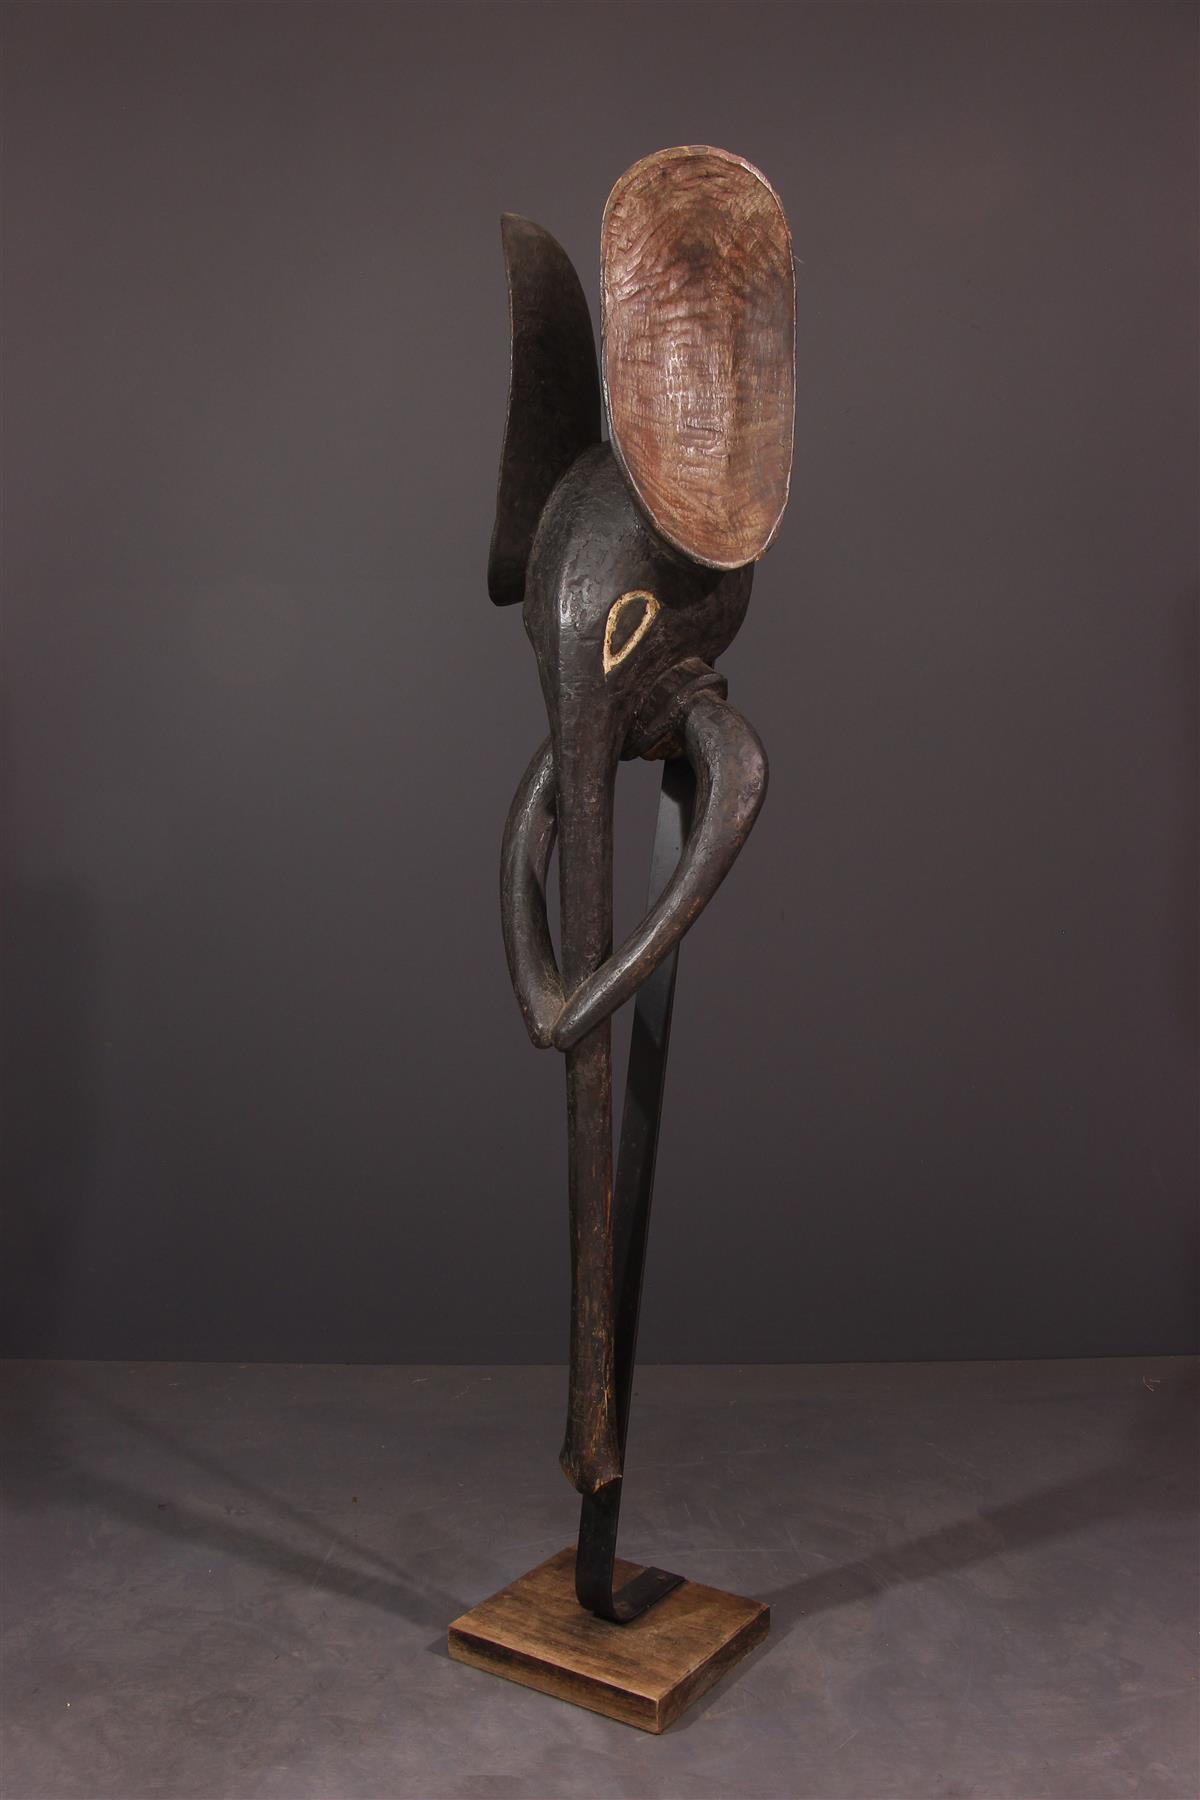 Masque Babanki - Art africain